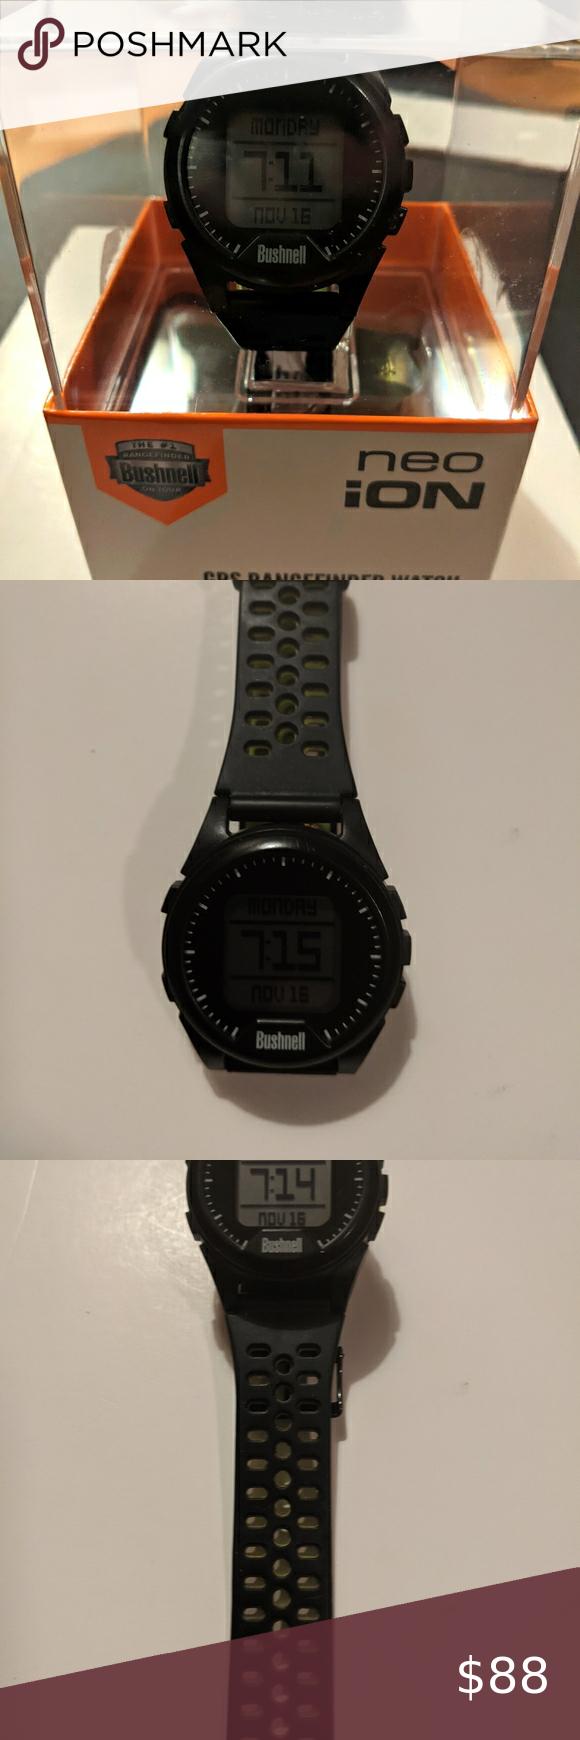 27++ Bushnell ion 2 golf gps watch manual ideas in 2021